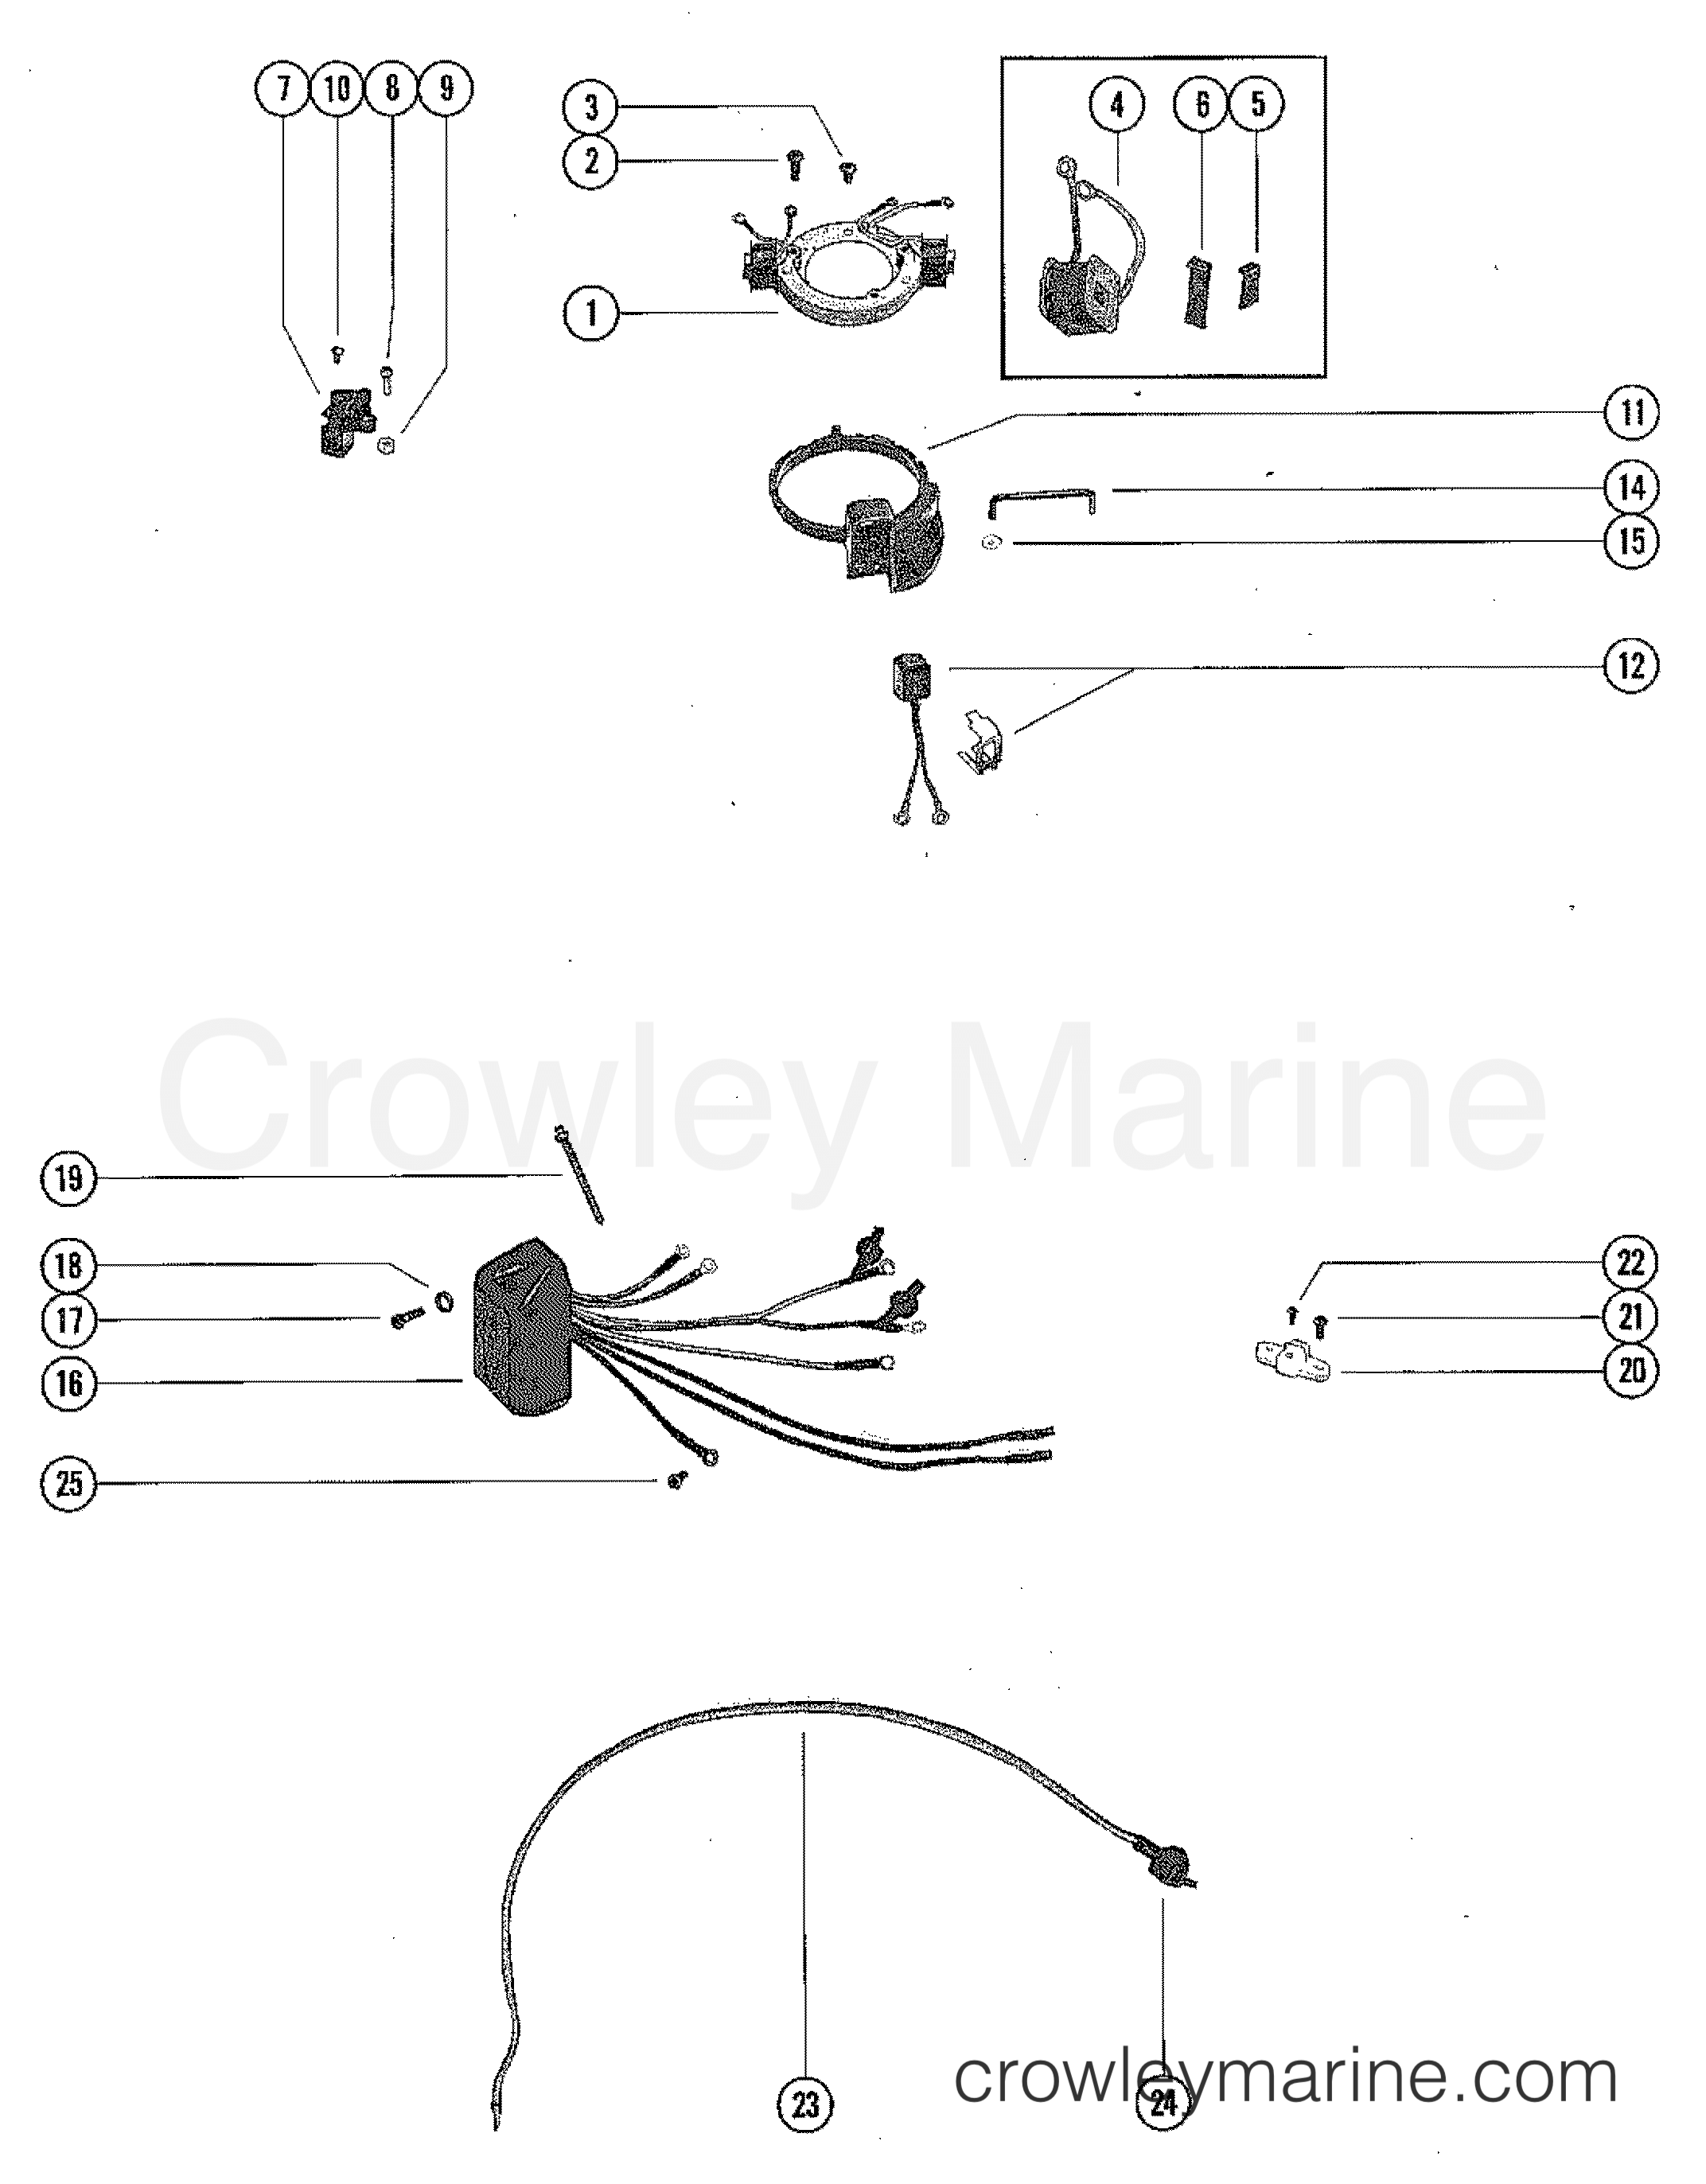 ignition components 1975 mercury outboard 7 5 1075205. Black Bedroom Furniture Sets. Home Design Ideas